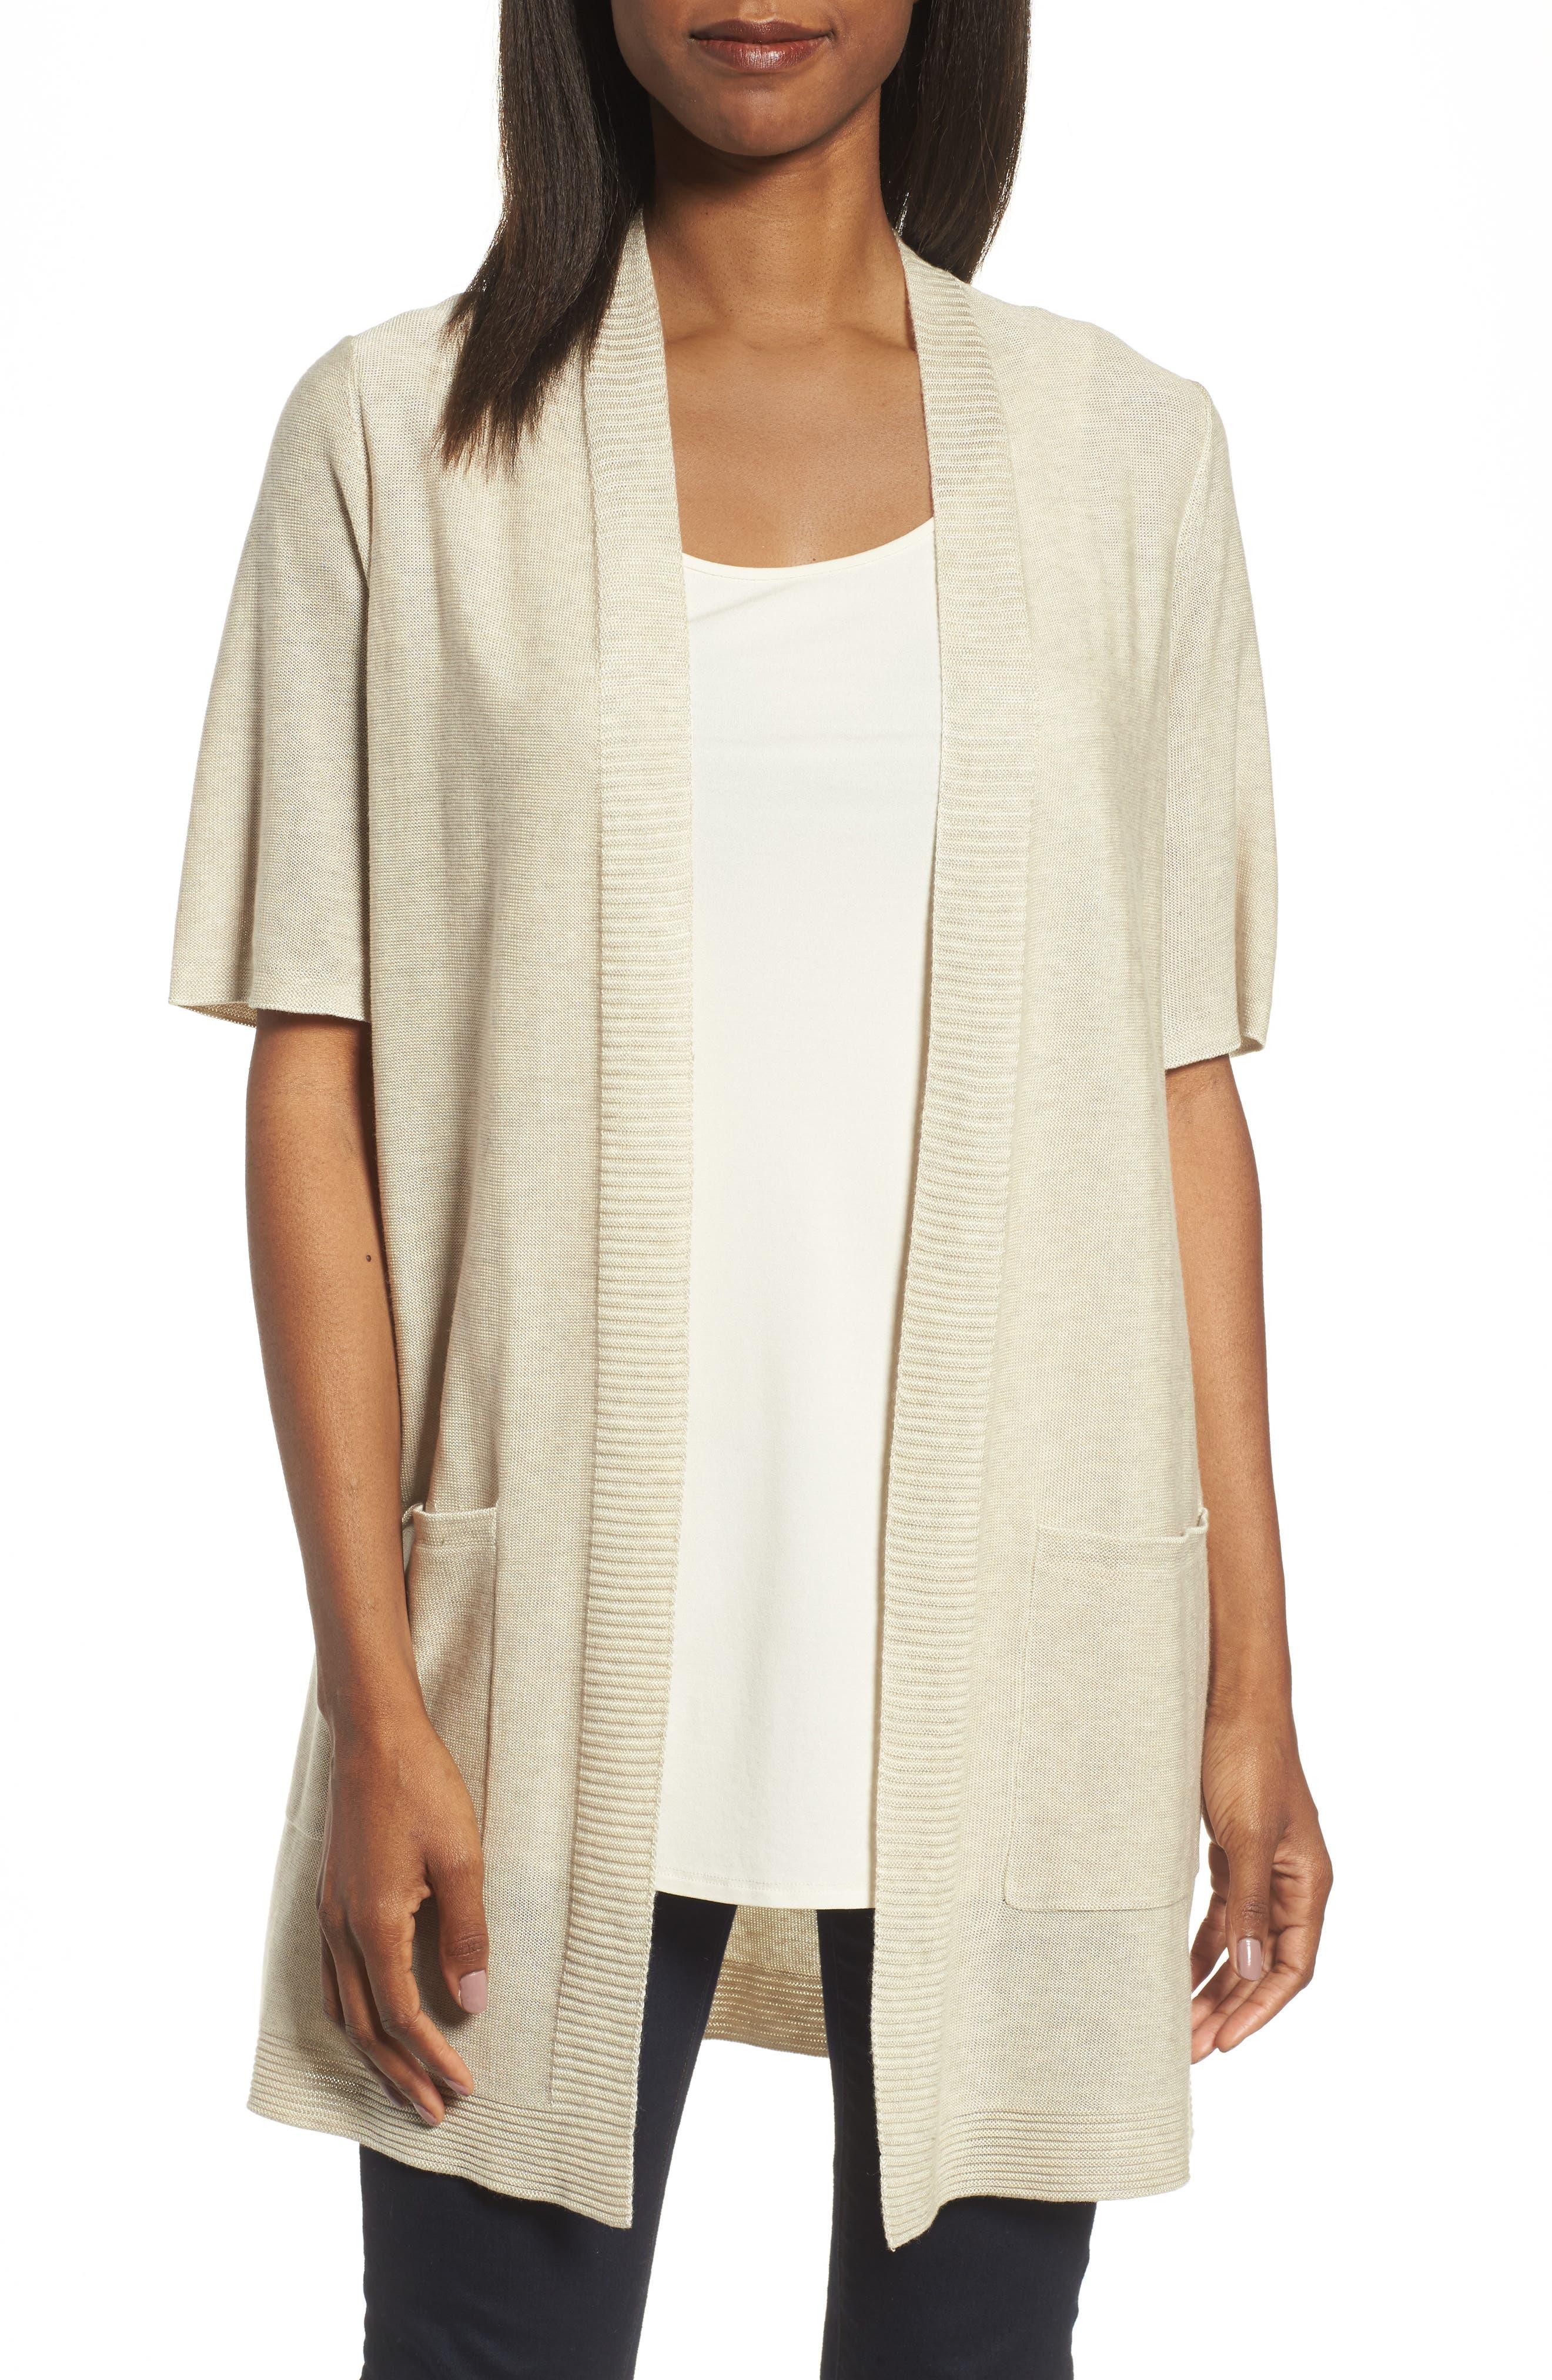 Eileen Fisher Simple Tencel® & Merino Wool Cardigan